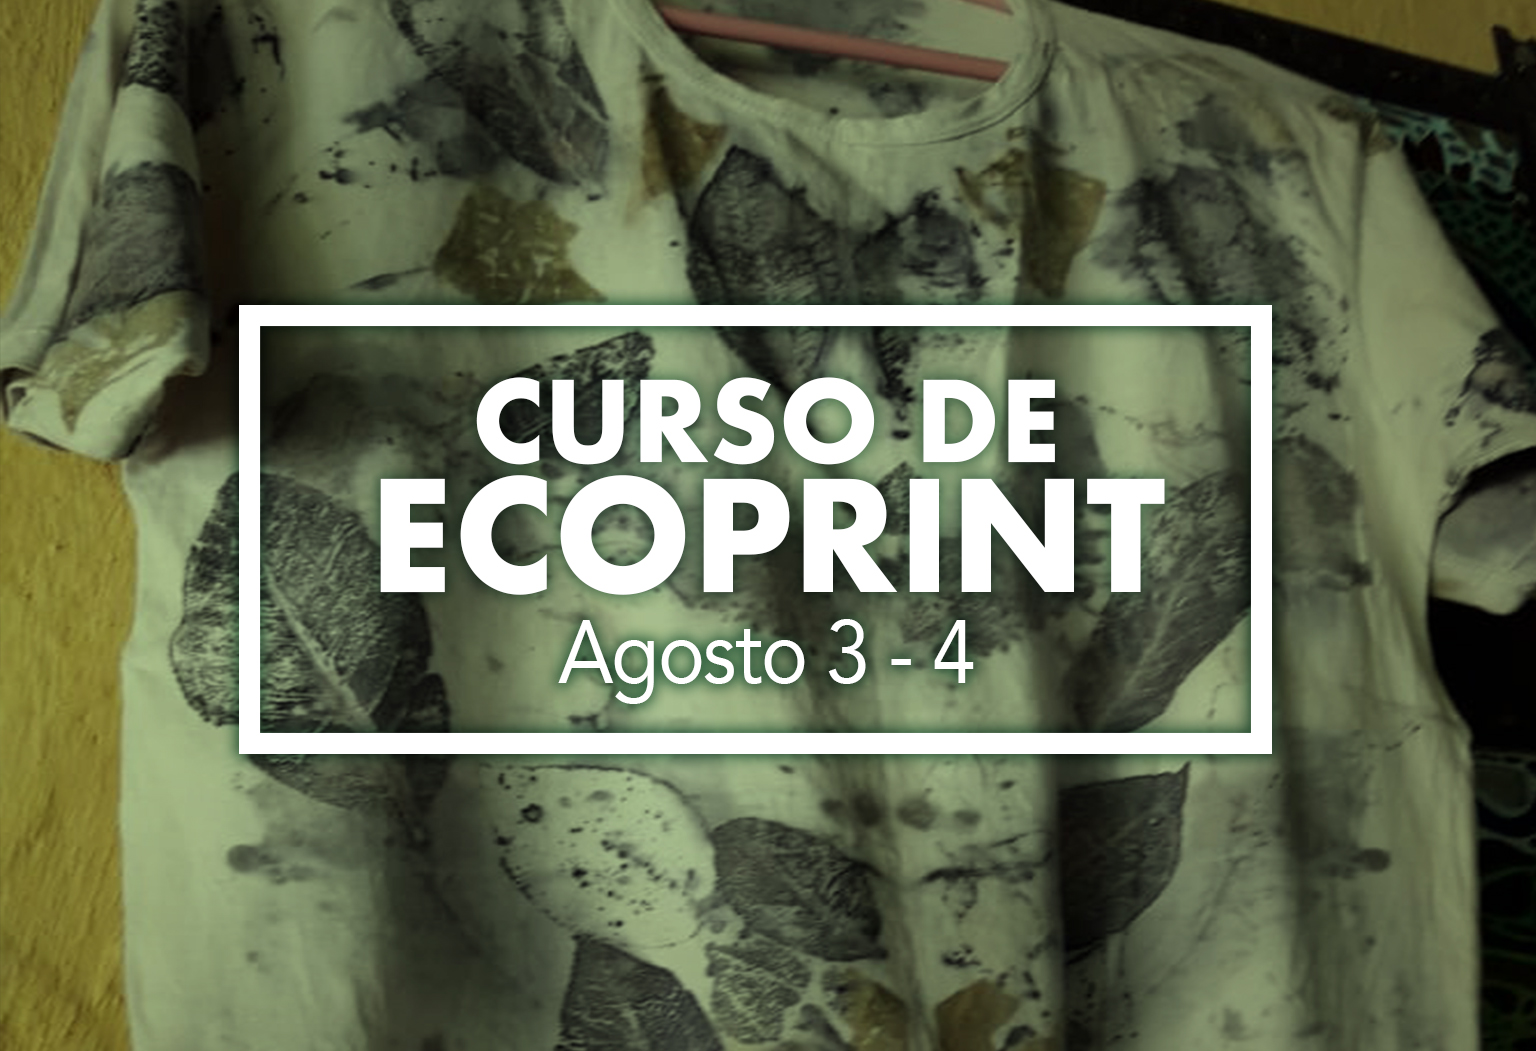 ecoprint banner 2.jpg